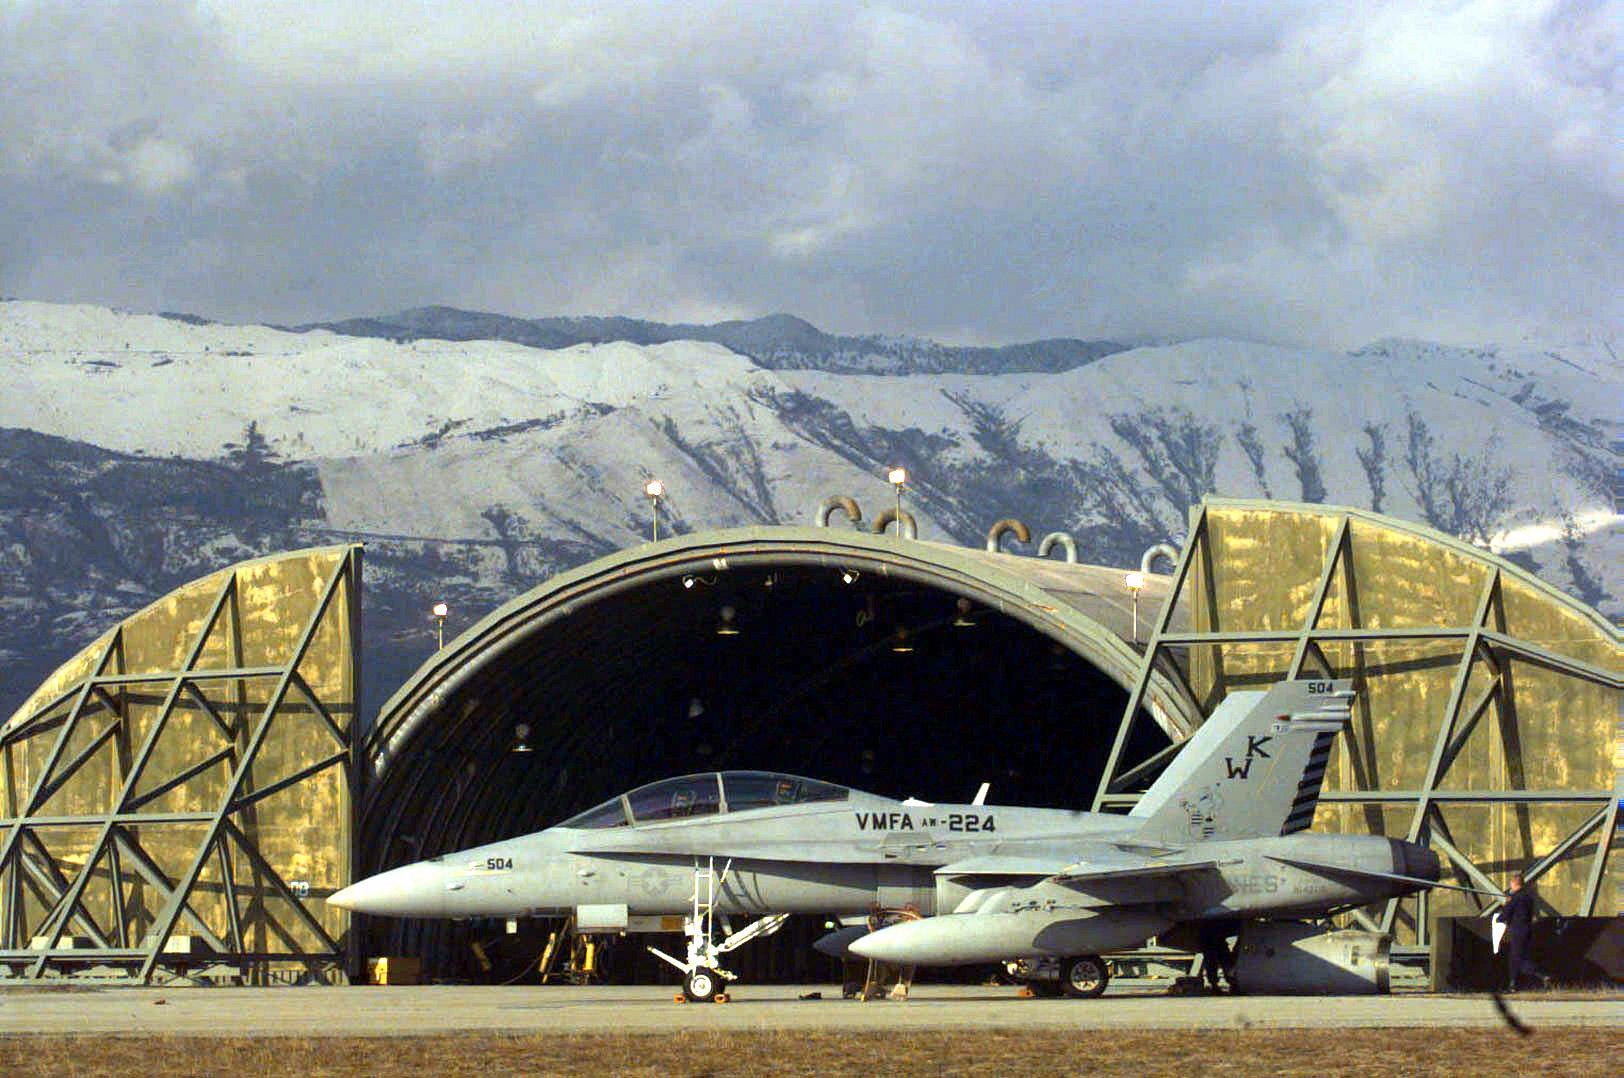 File:F-18 Aviano.jpg - Wikimedia Commons